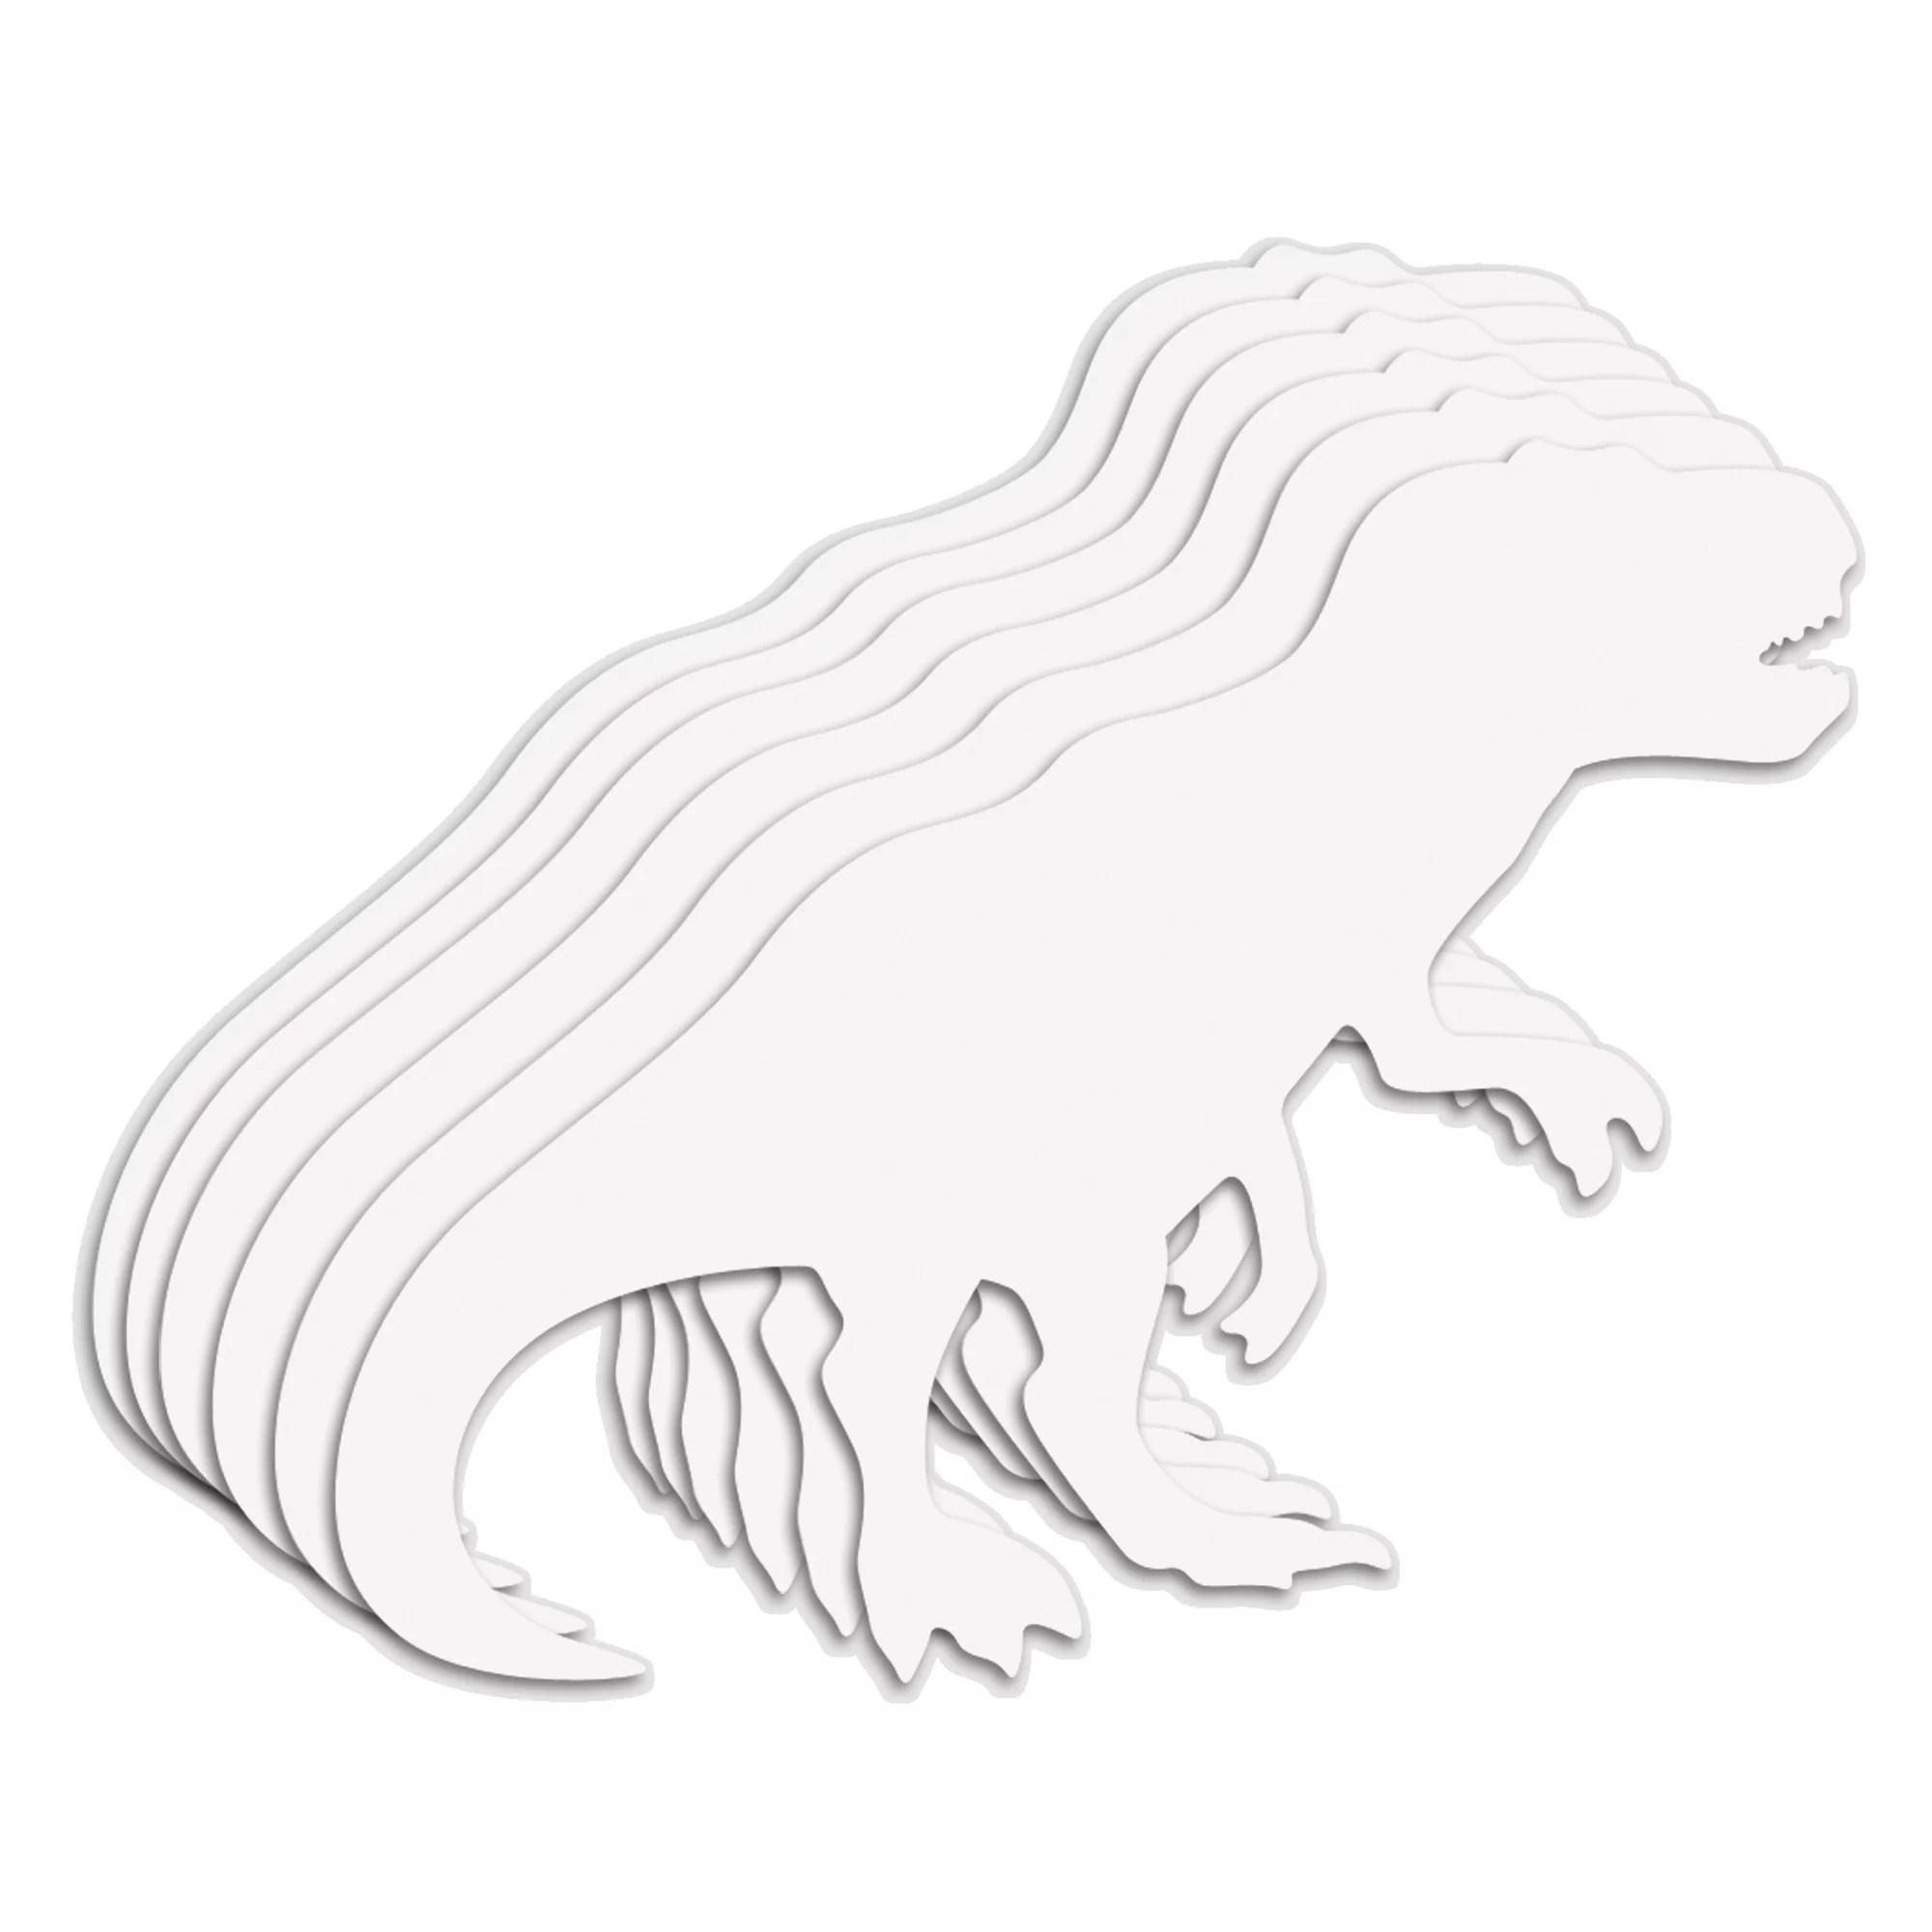 Mammoth 019 Wiring Diagrams. . Wiring Diagram on